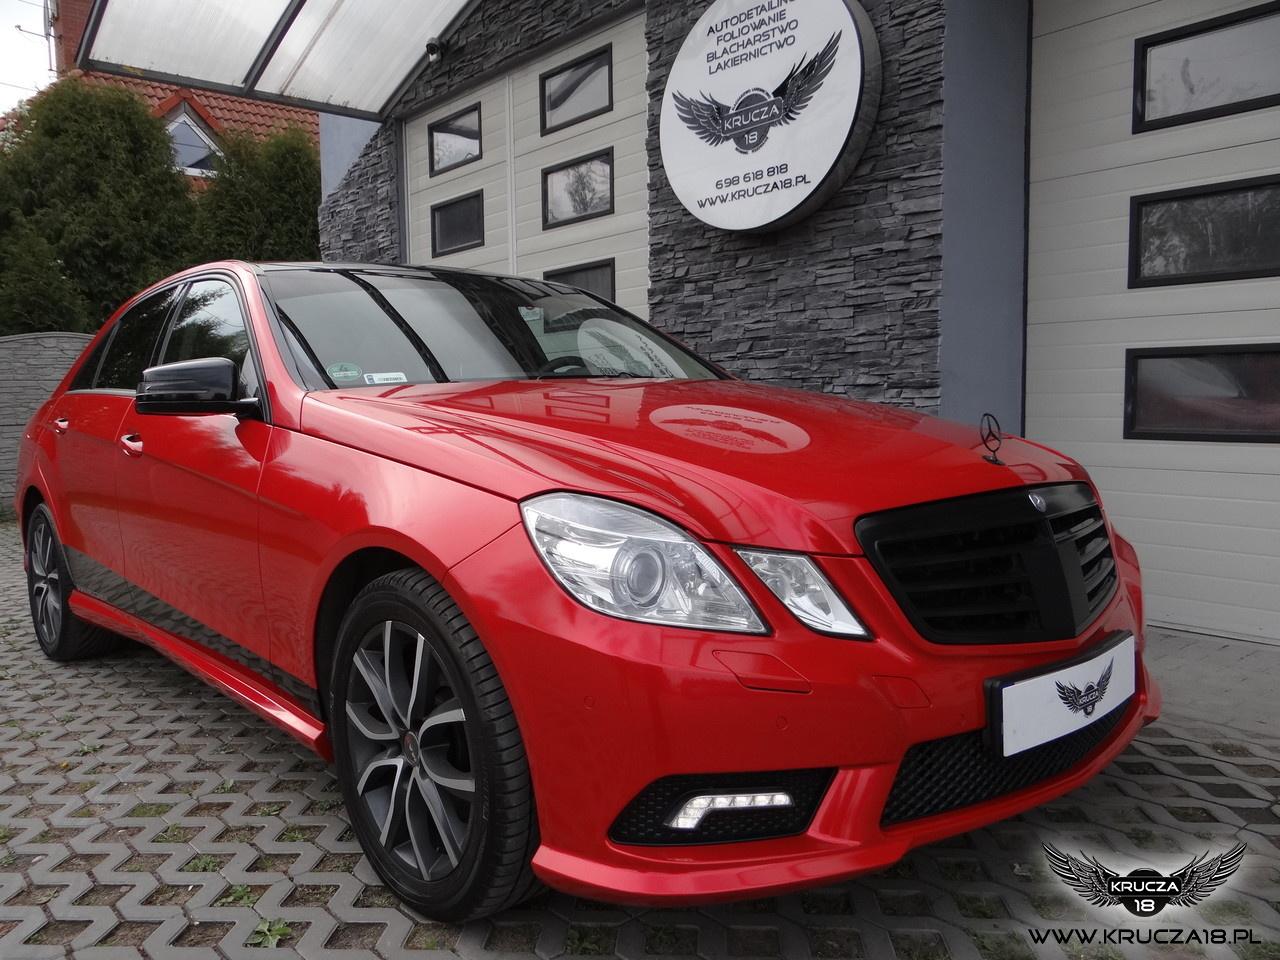 Mercedes / zmiana koloru folią na Rot Metallic